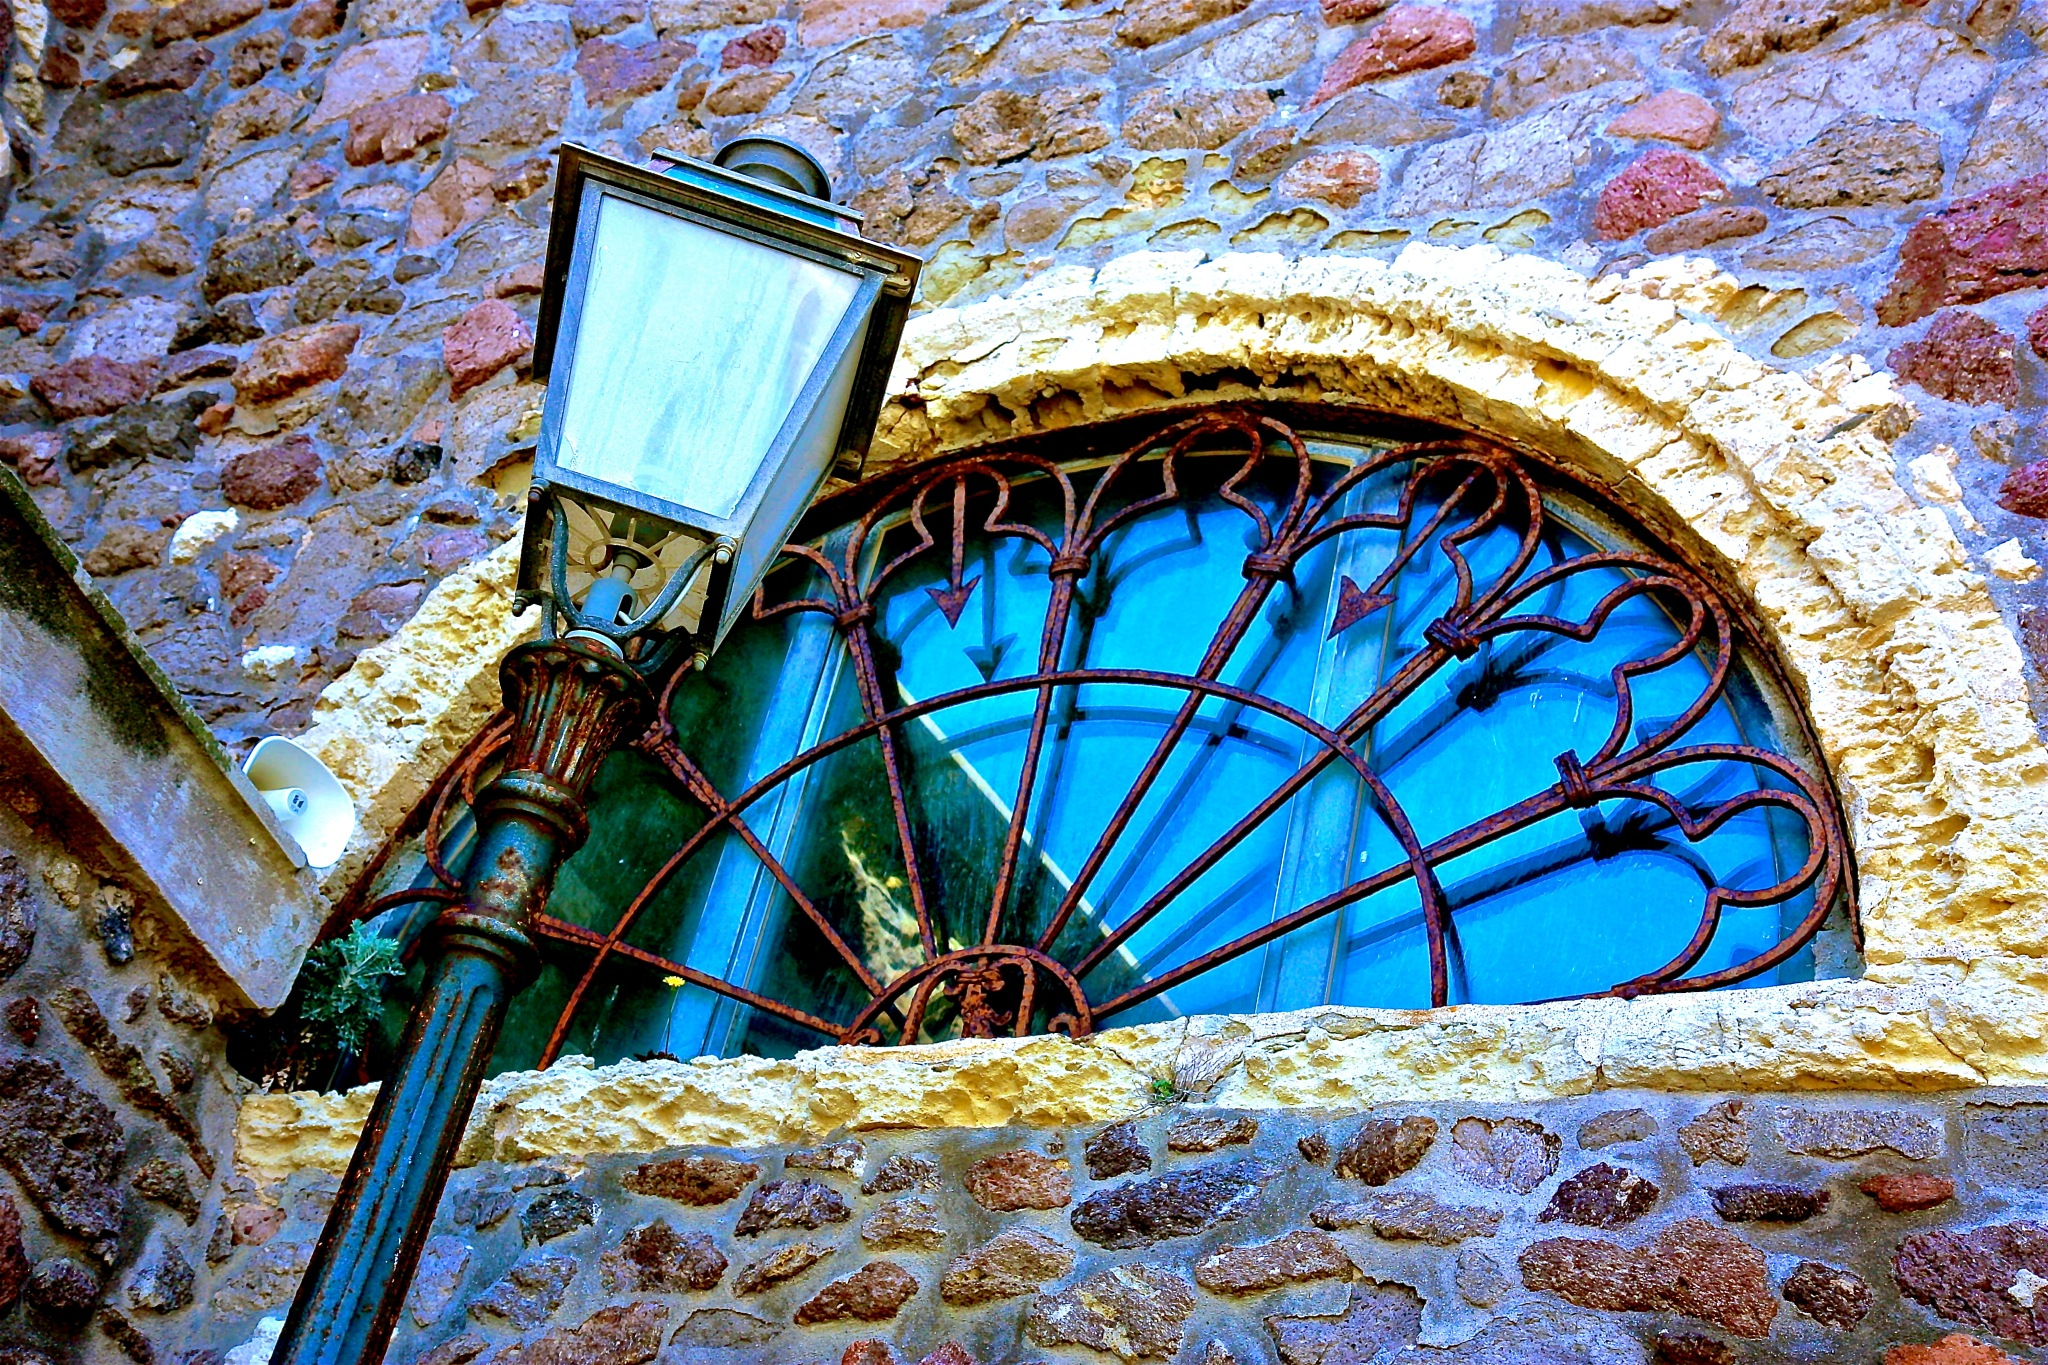 A Window of Light by Steven Thomas Densley